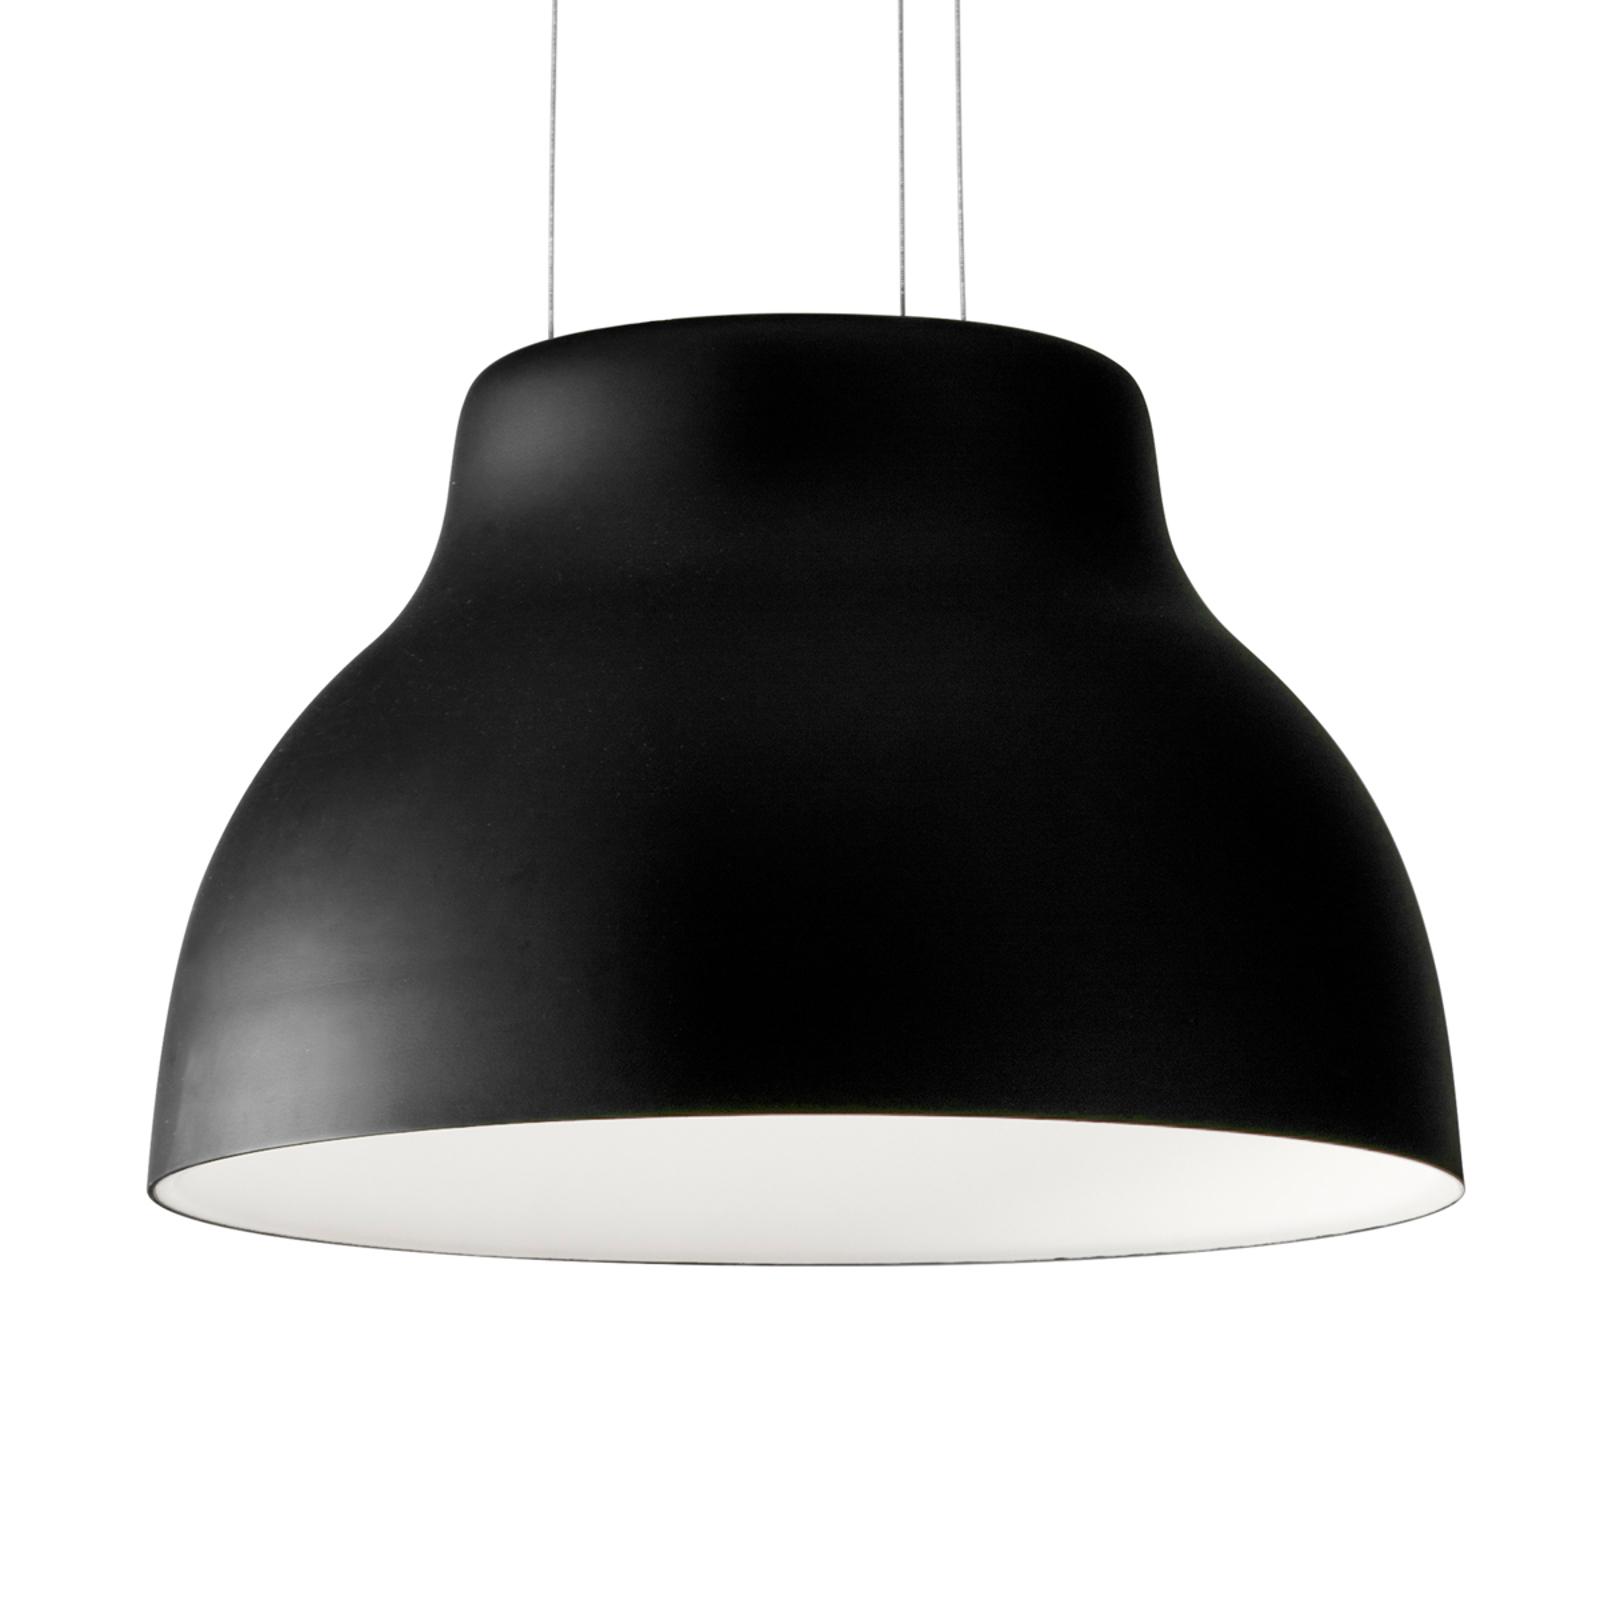 Martinelli Luce Cicala - LED-Pendelleuchte schwarz